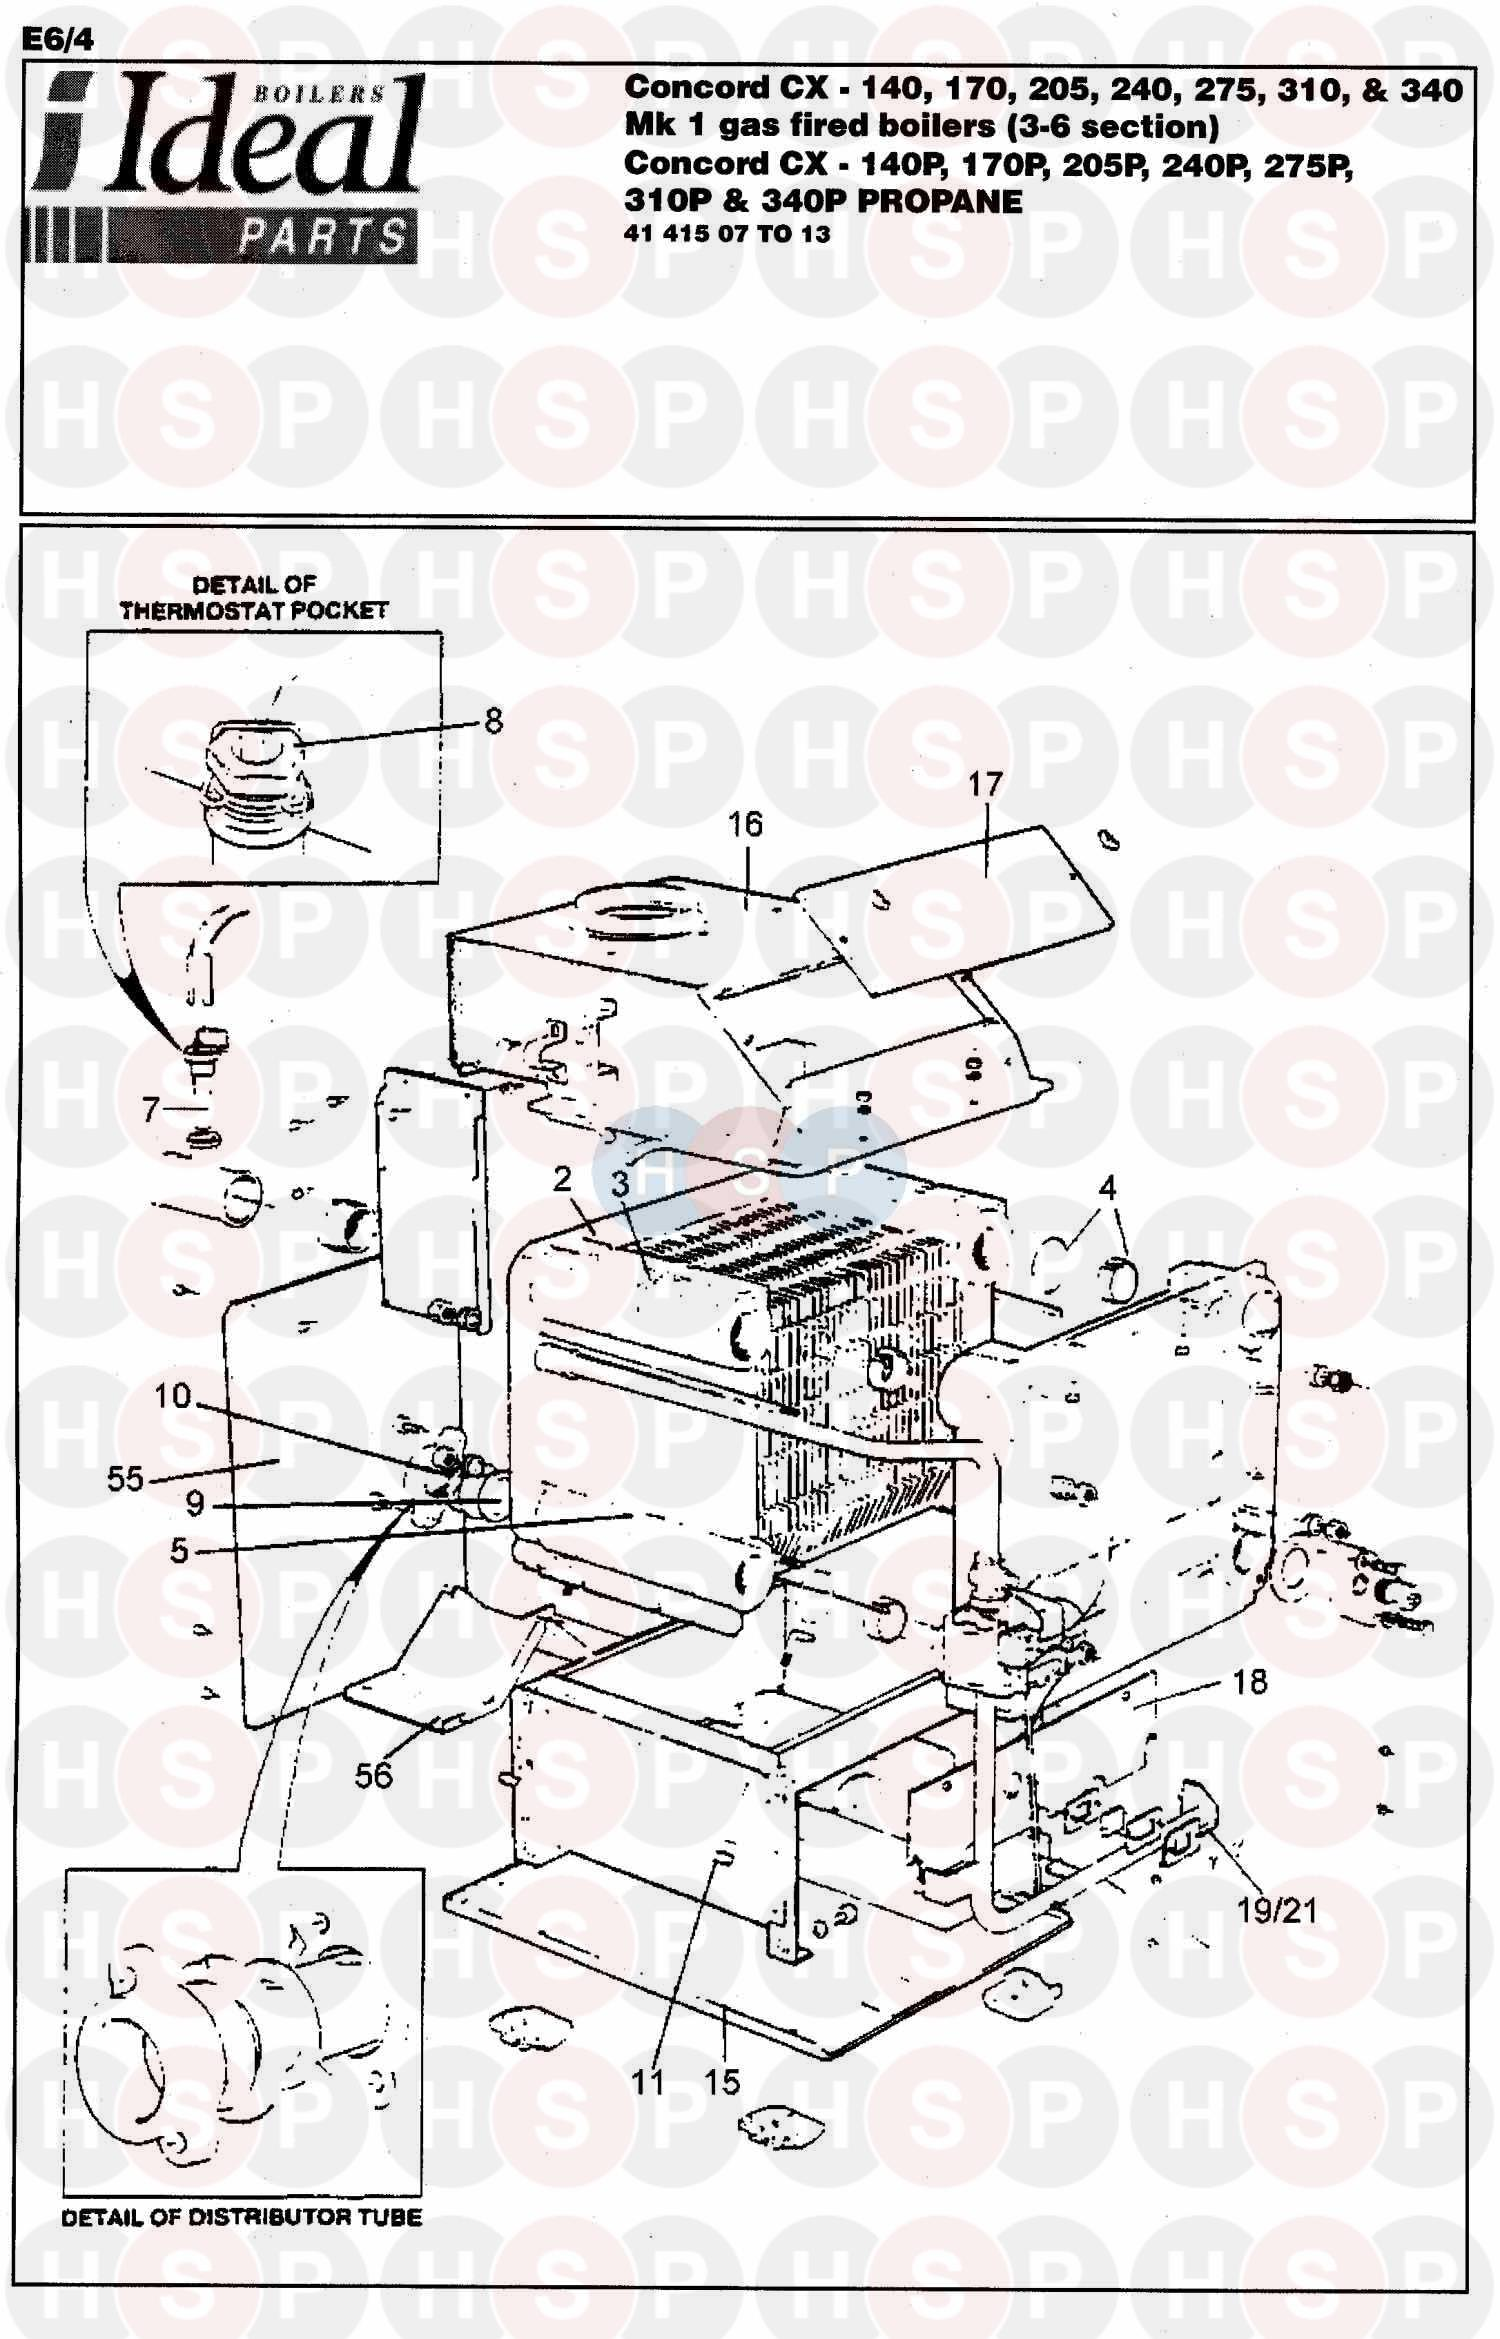 ideal concord cx 240 240p boiler diagram boiler. Black Bedroom Furniture Sets. Home Design Ideas